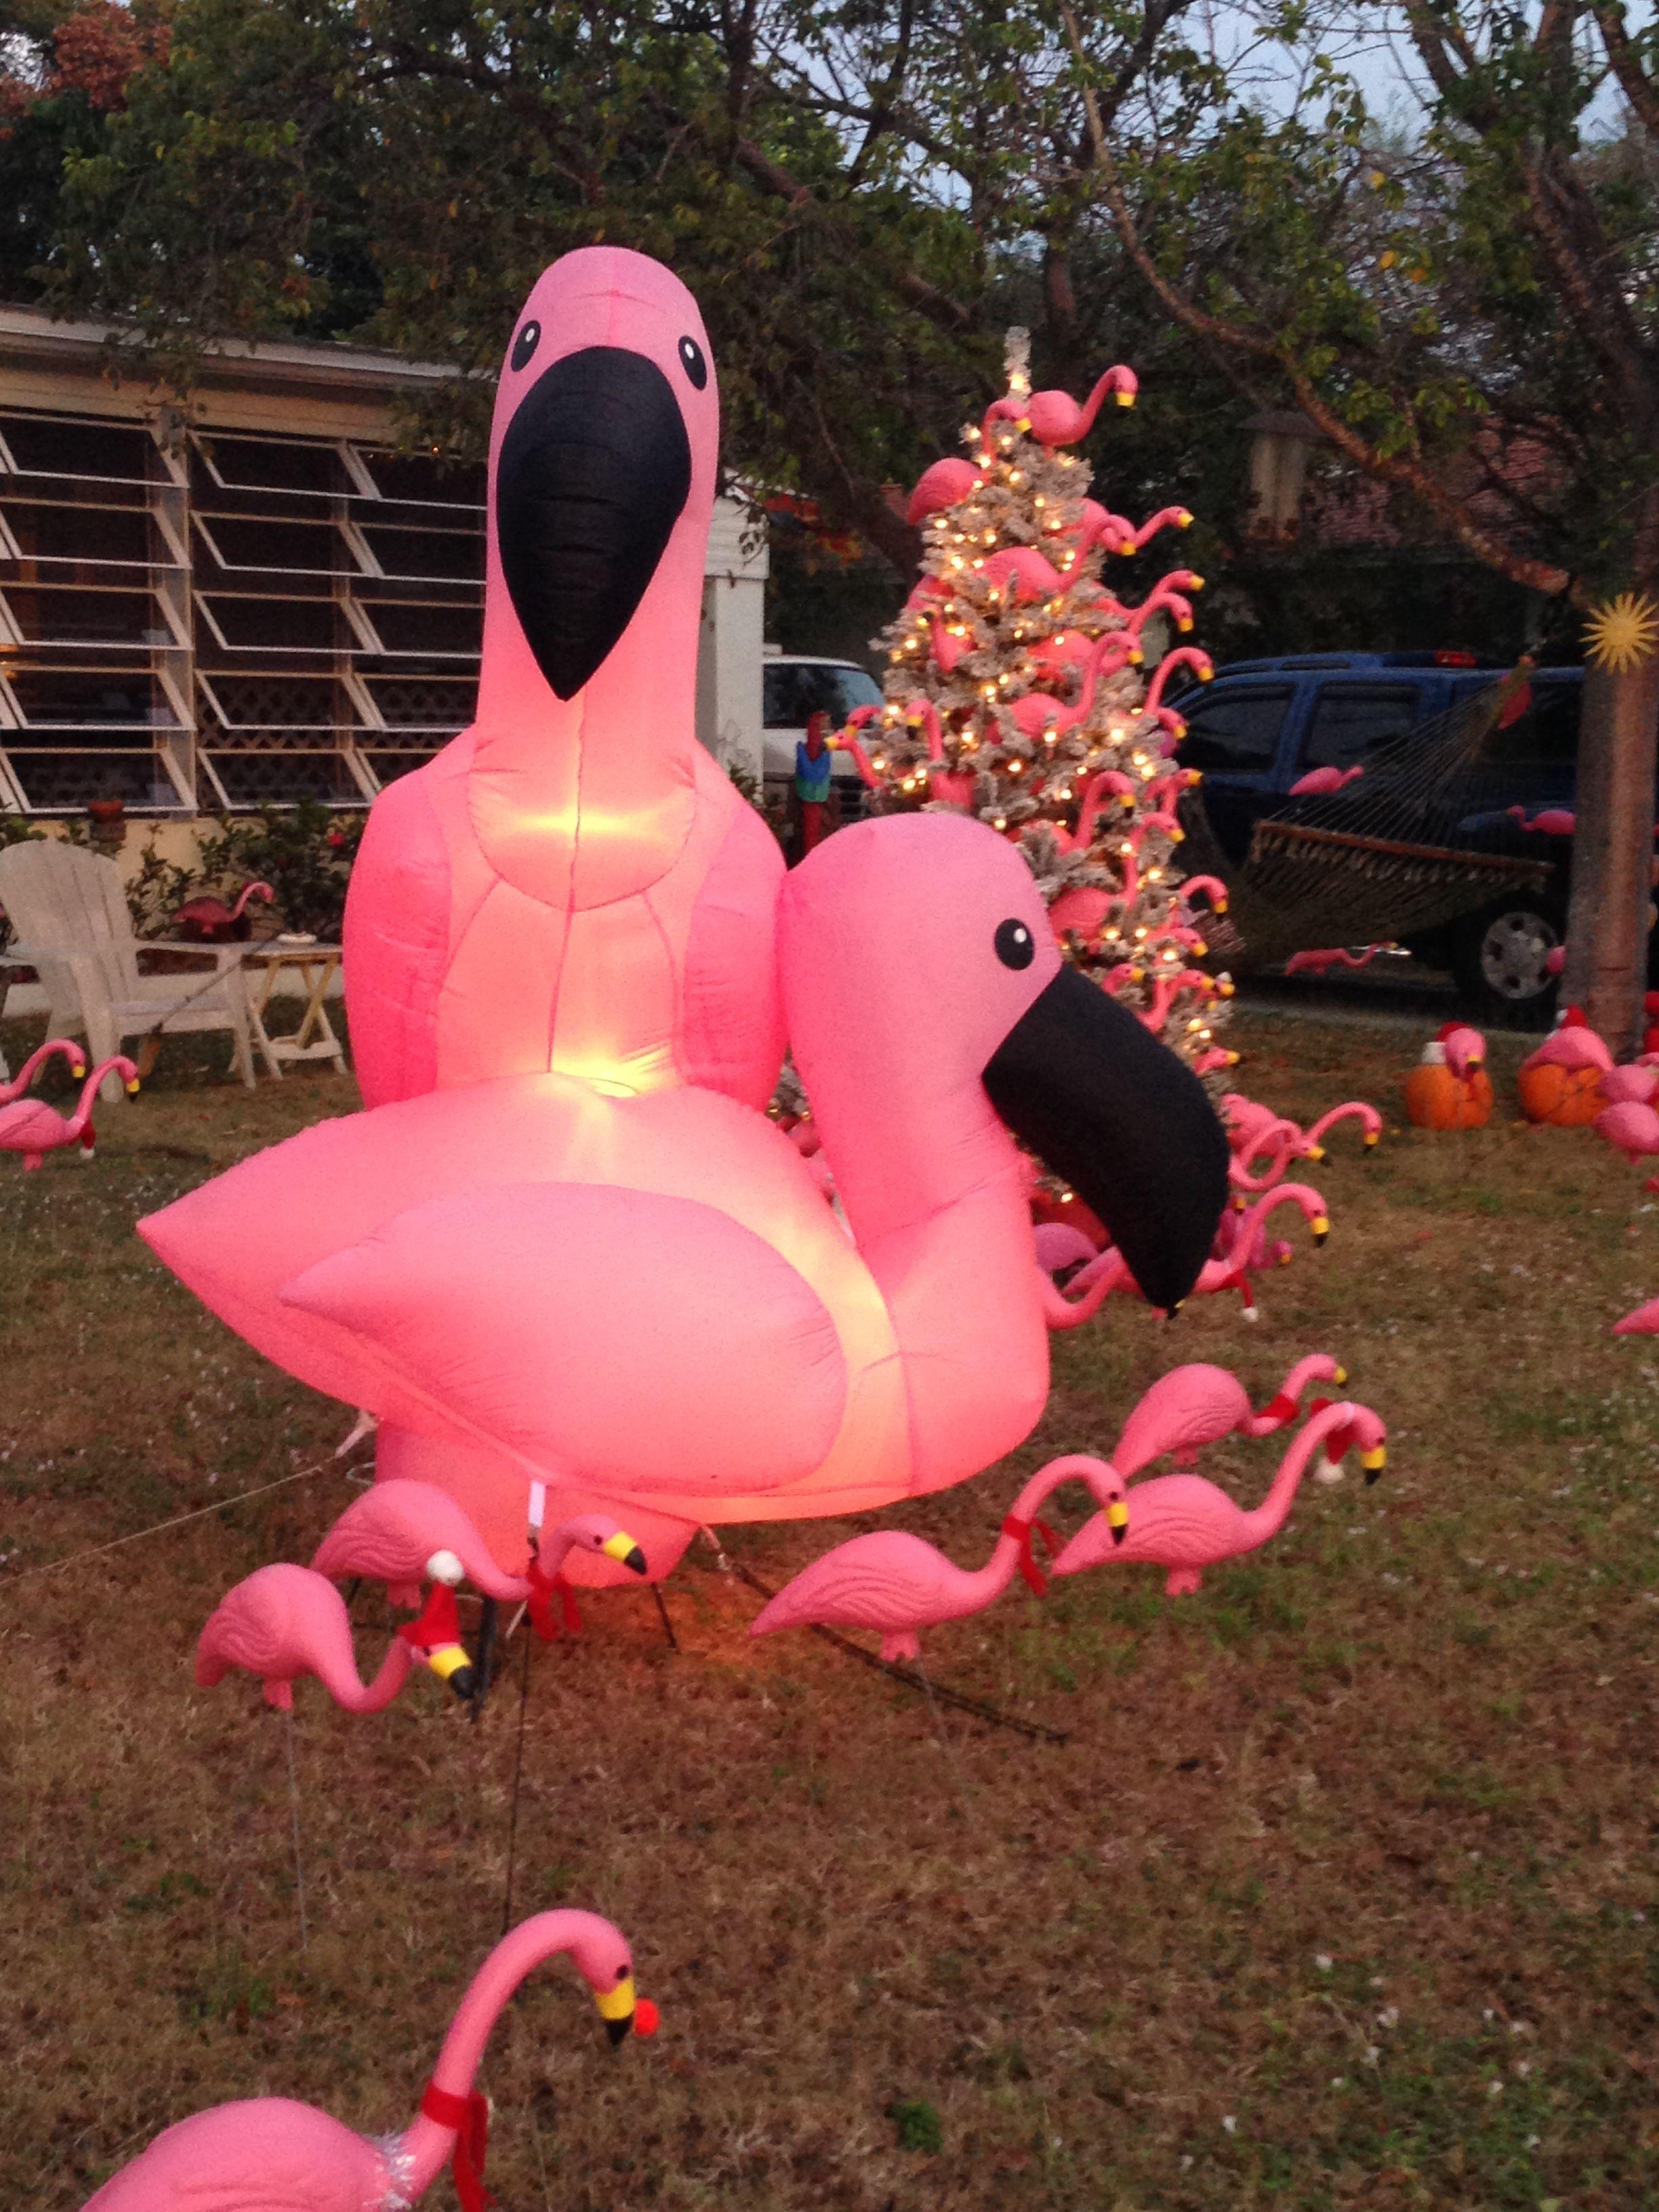 Flamingo christmas lawn decor flamingos love them for Flamingo dekoration